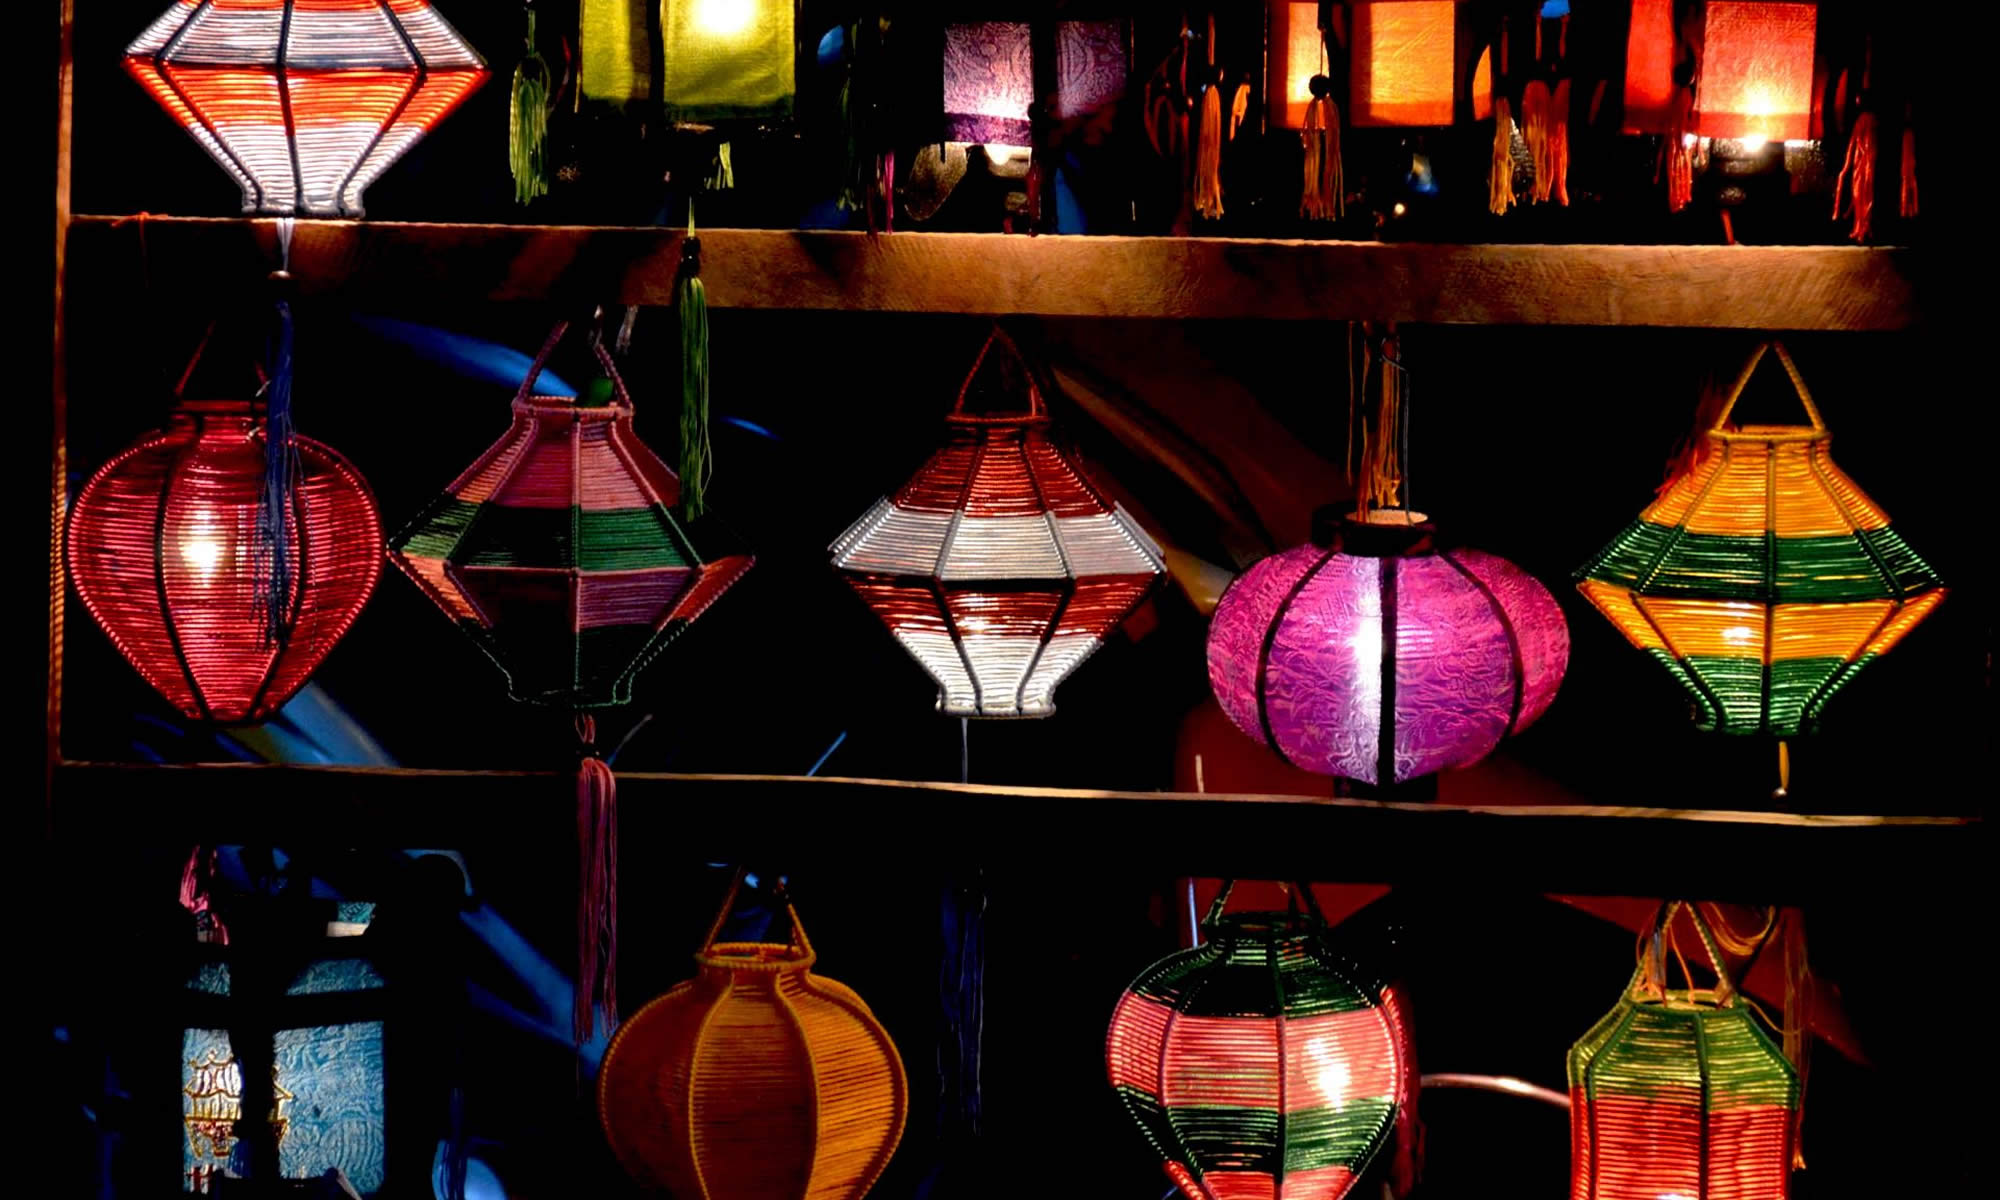 Light Wisdom Inspired by a Sea of Vietnamese Lanterns